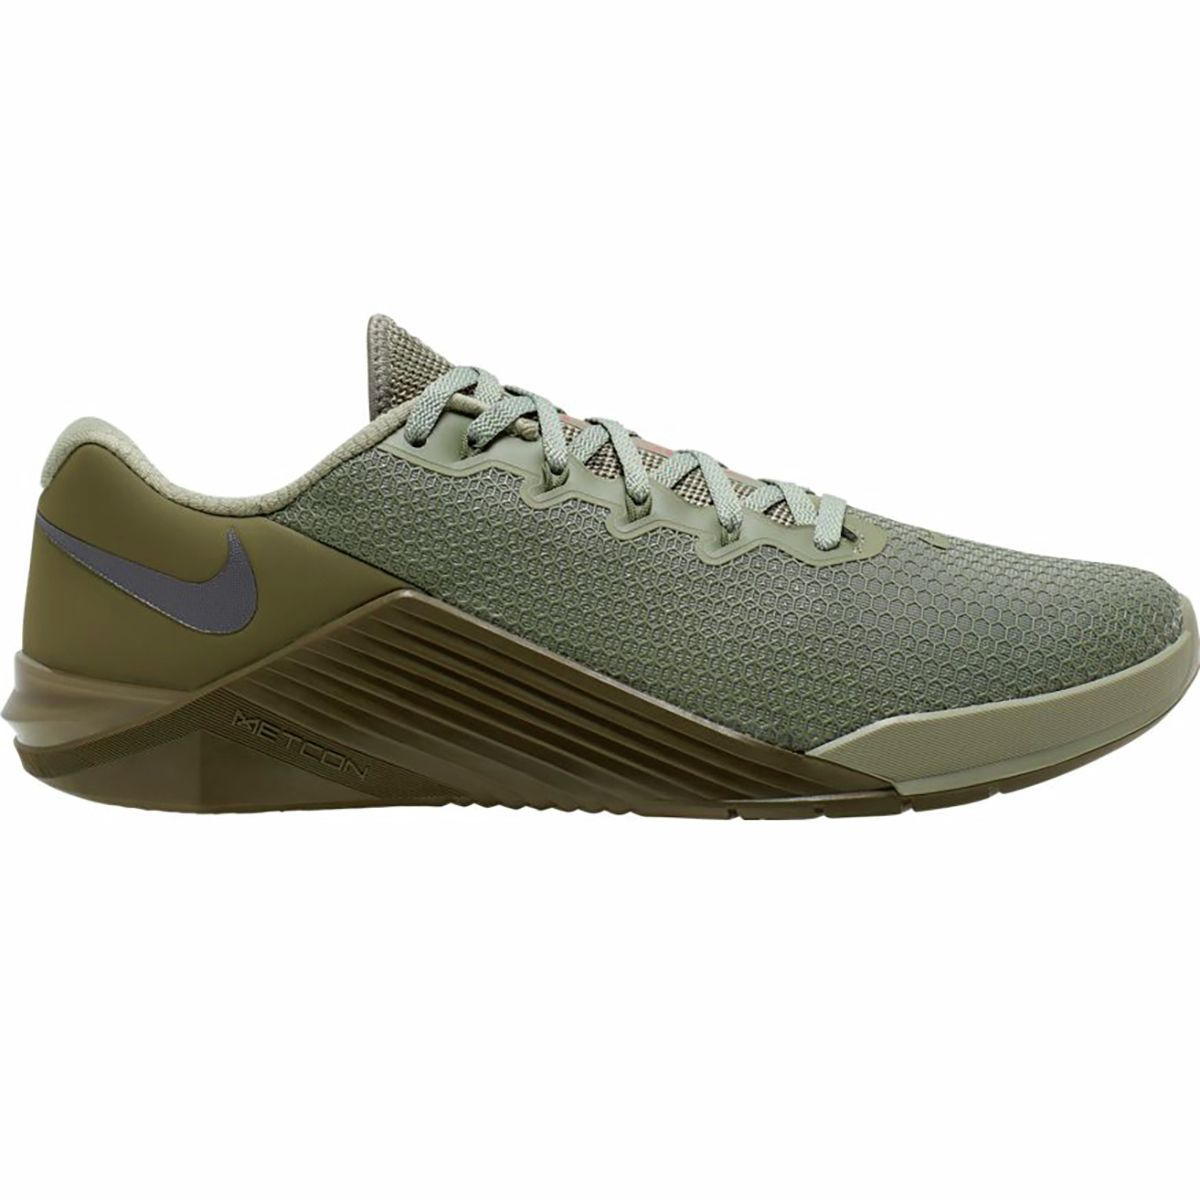 Nike Metcon 5 Training Shoe Men's | Mens training shoes